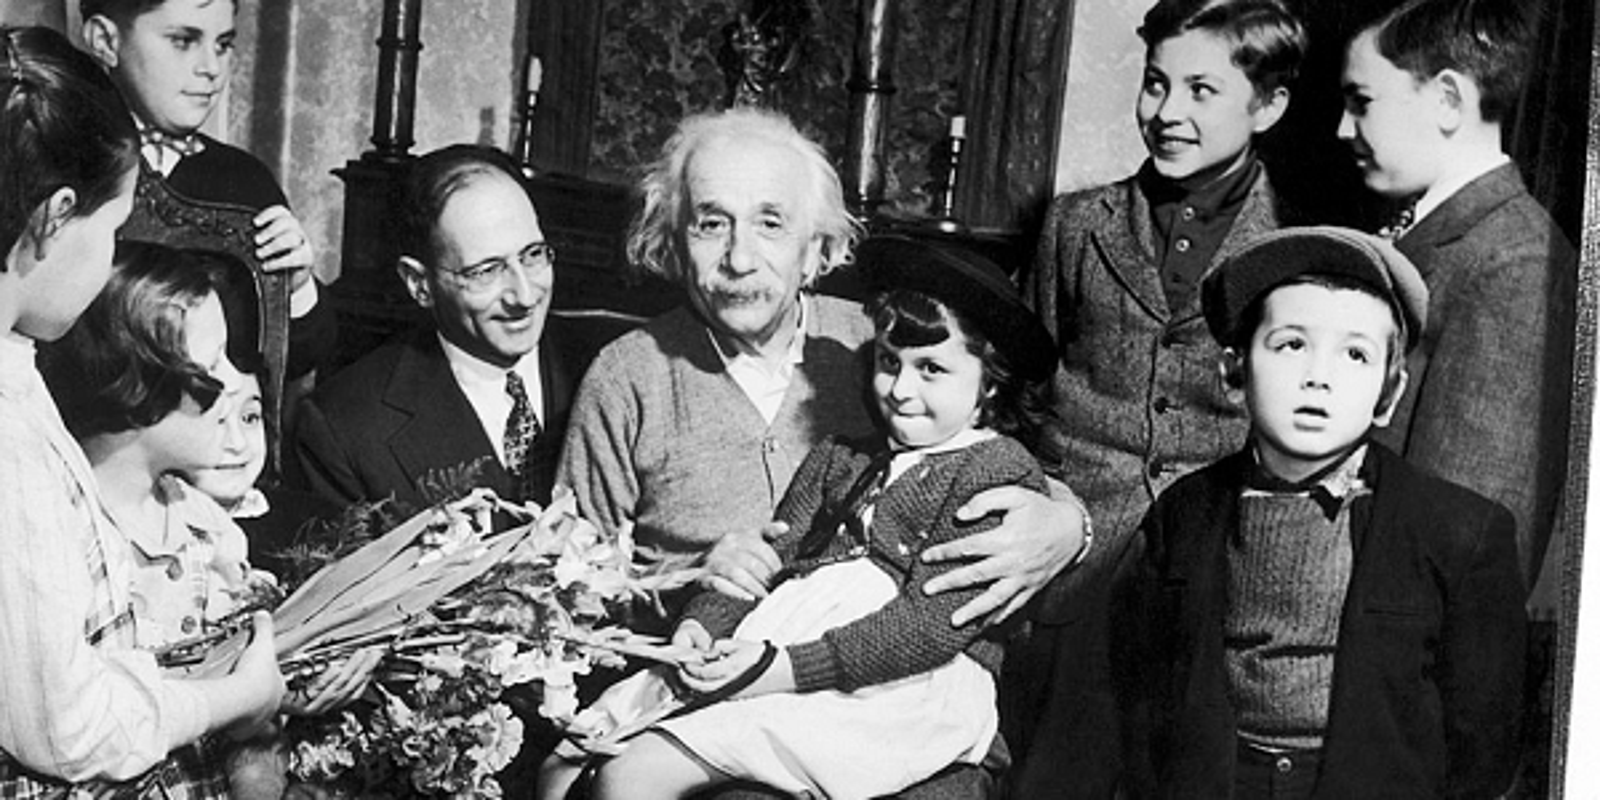 Nhung thoi quen khac biet tao nen bo nao thien tai Albert Einstein-Hinh-12